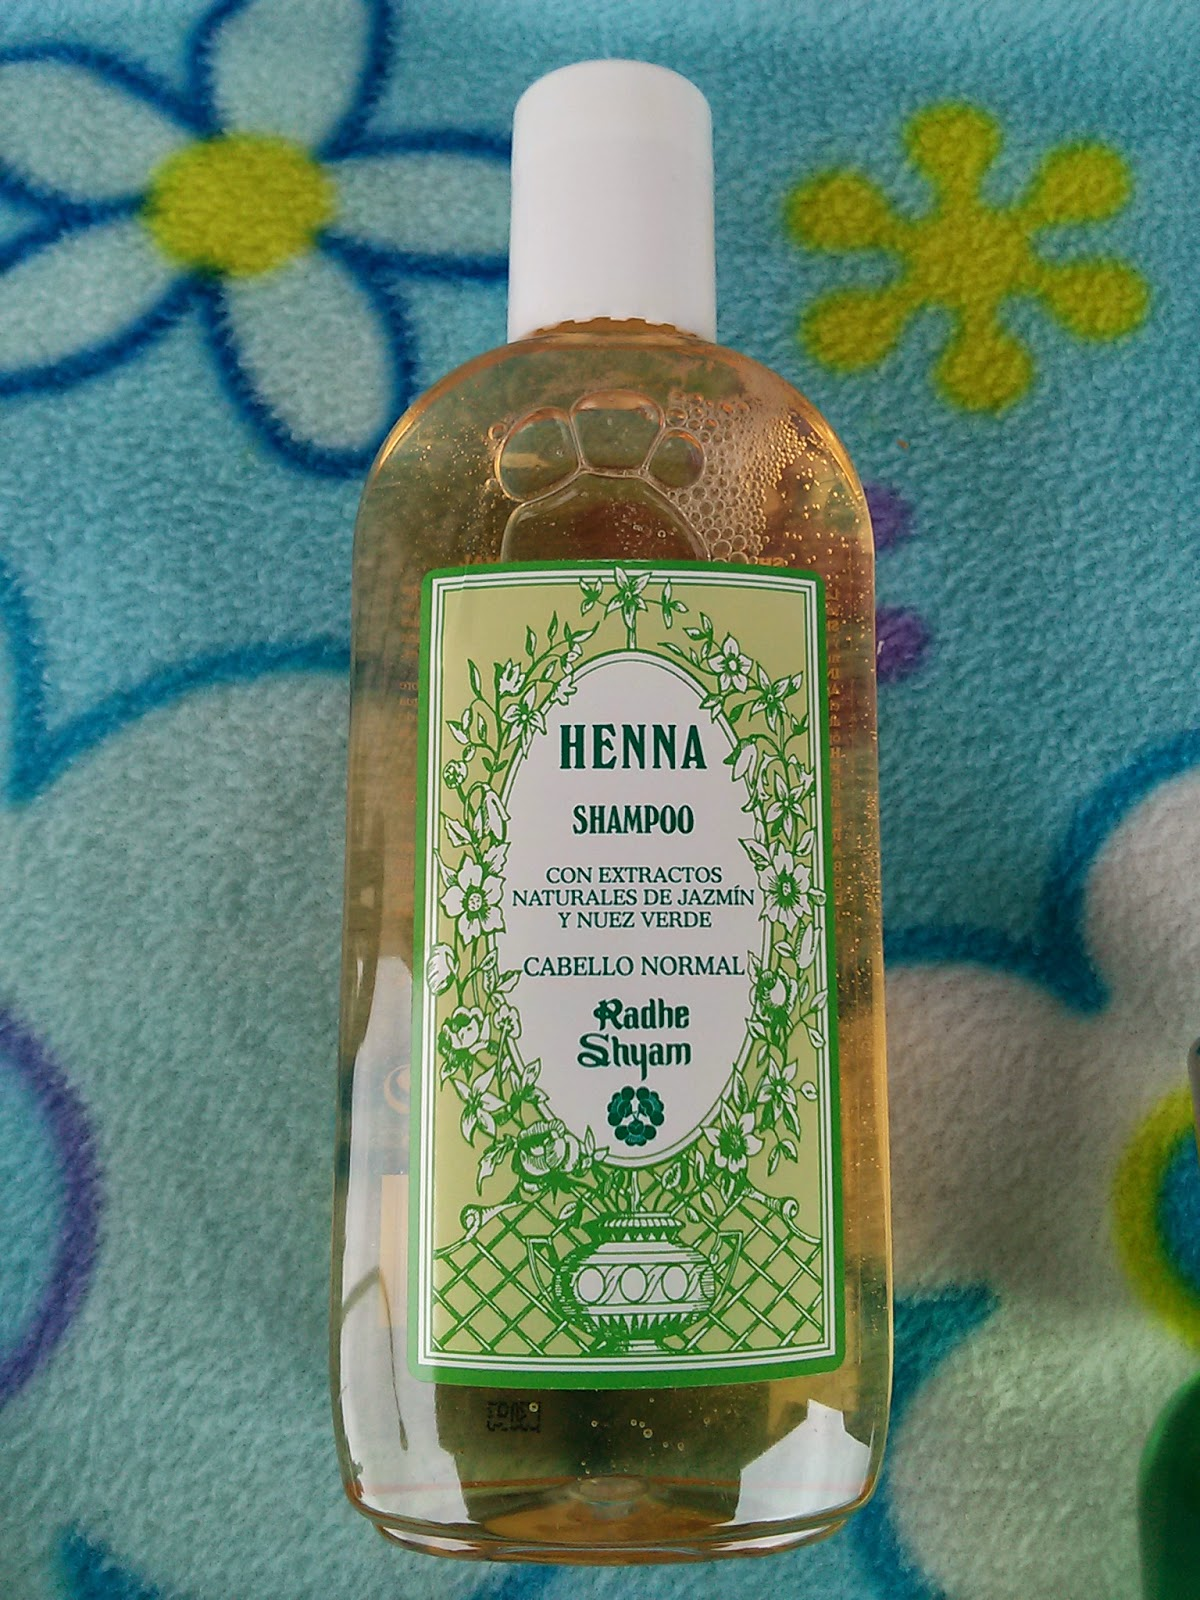 Shampoo de Radhe Shyam